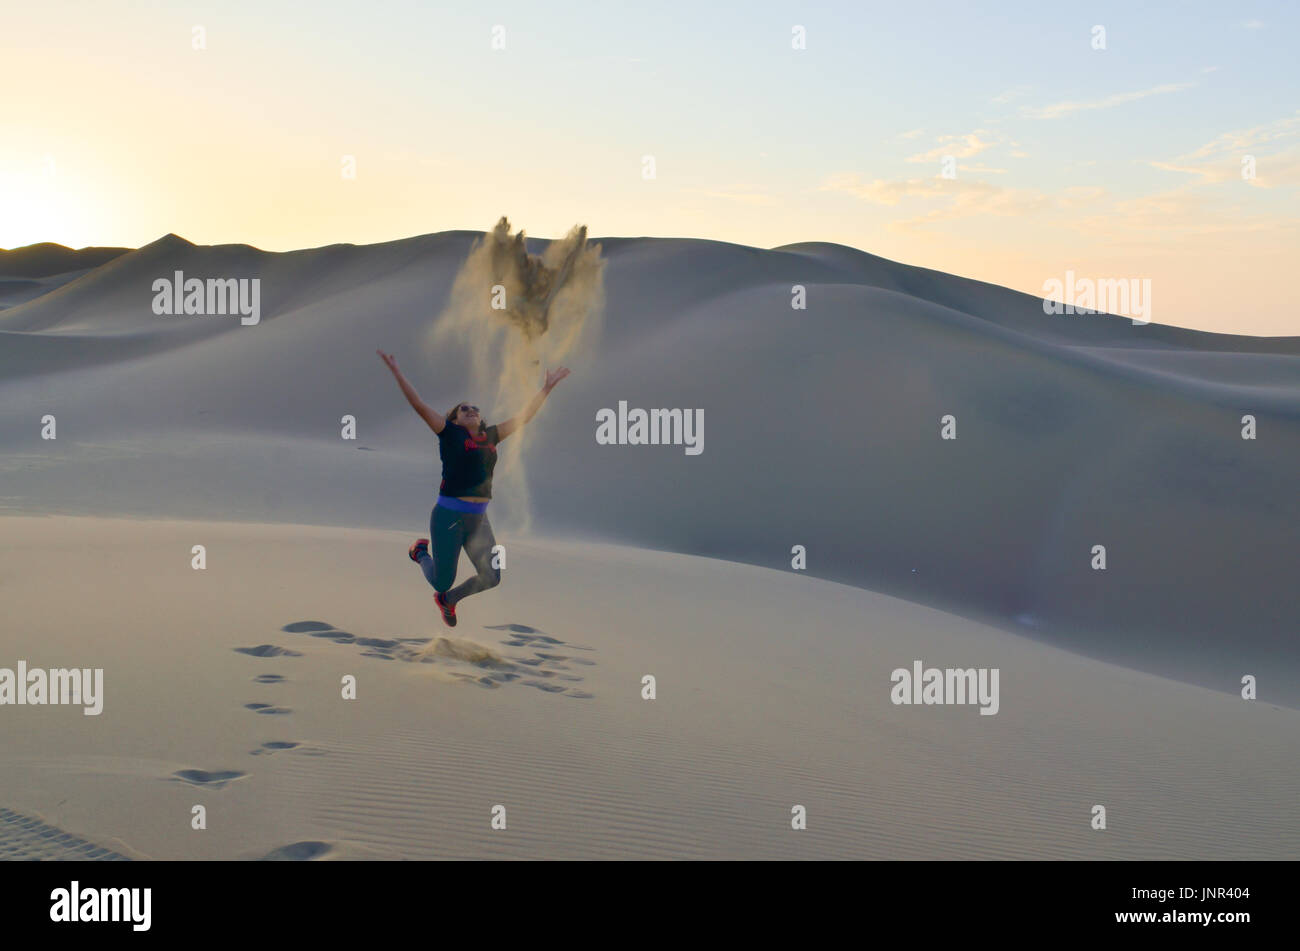 Woman enjoying the desert - Stock Image